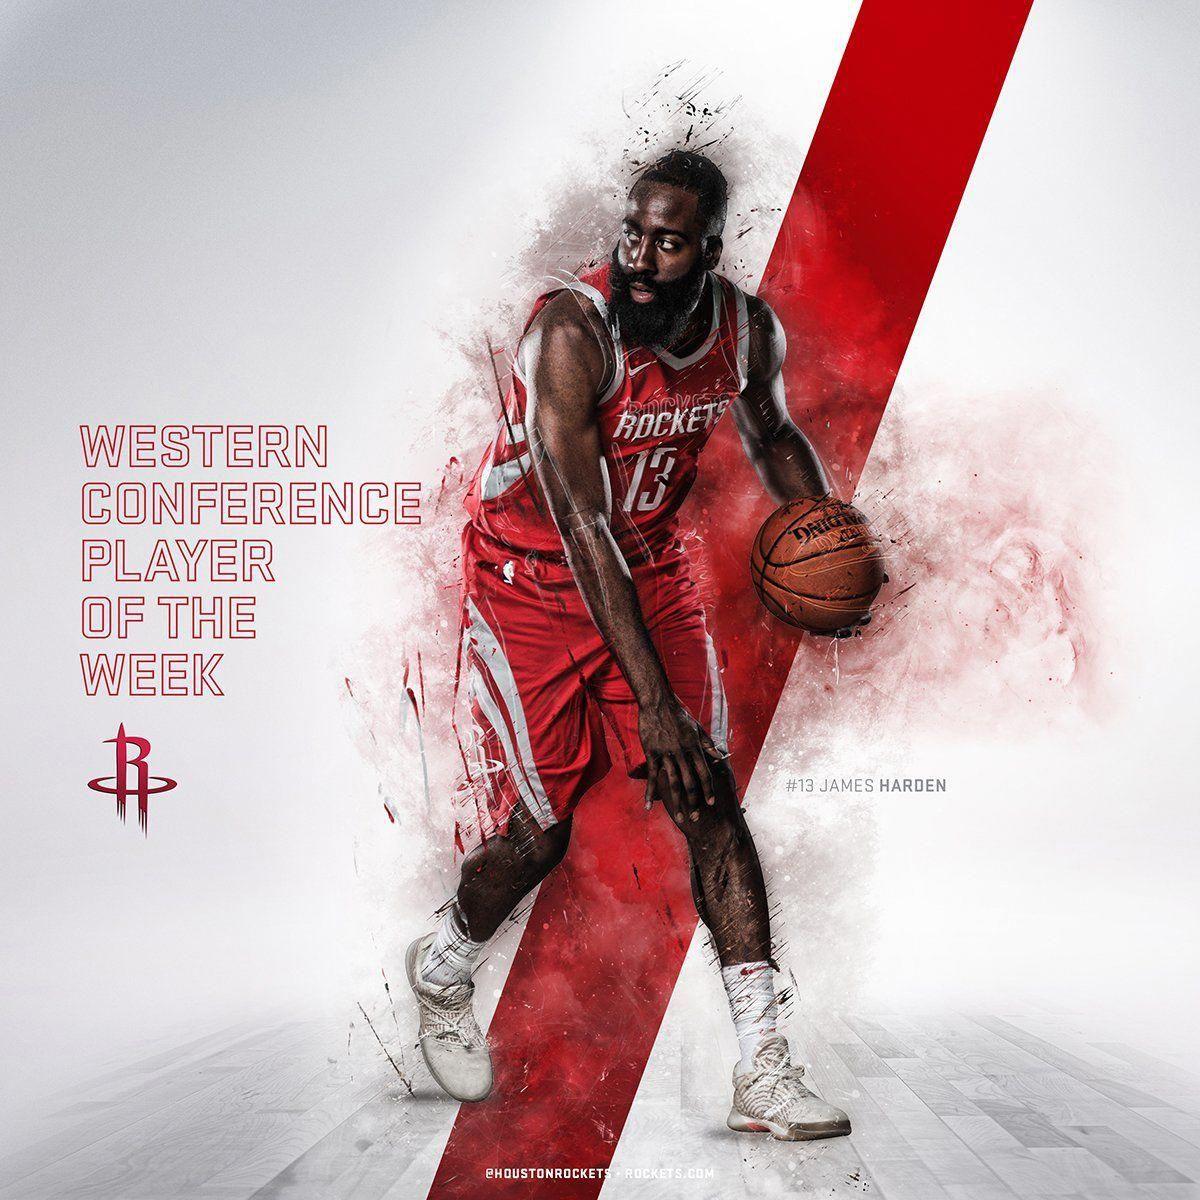 4 Twitter Photoshopdesign Sports Graphic Design Creative Poster Design Photoshop Design